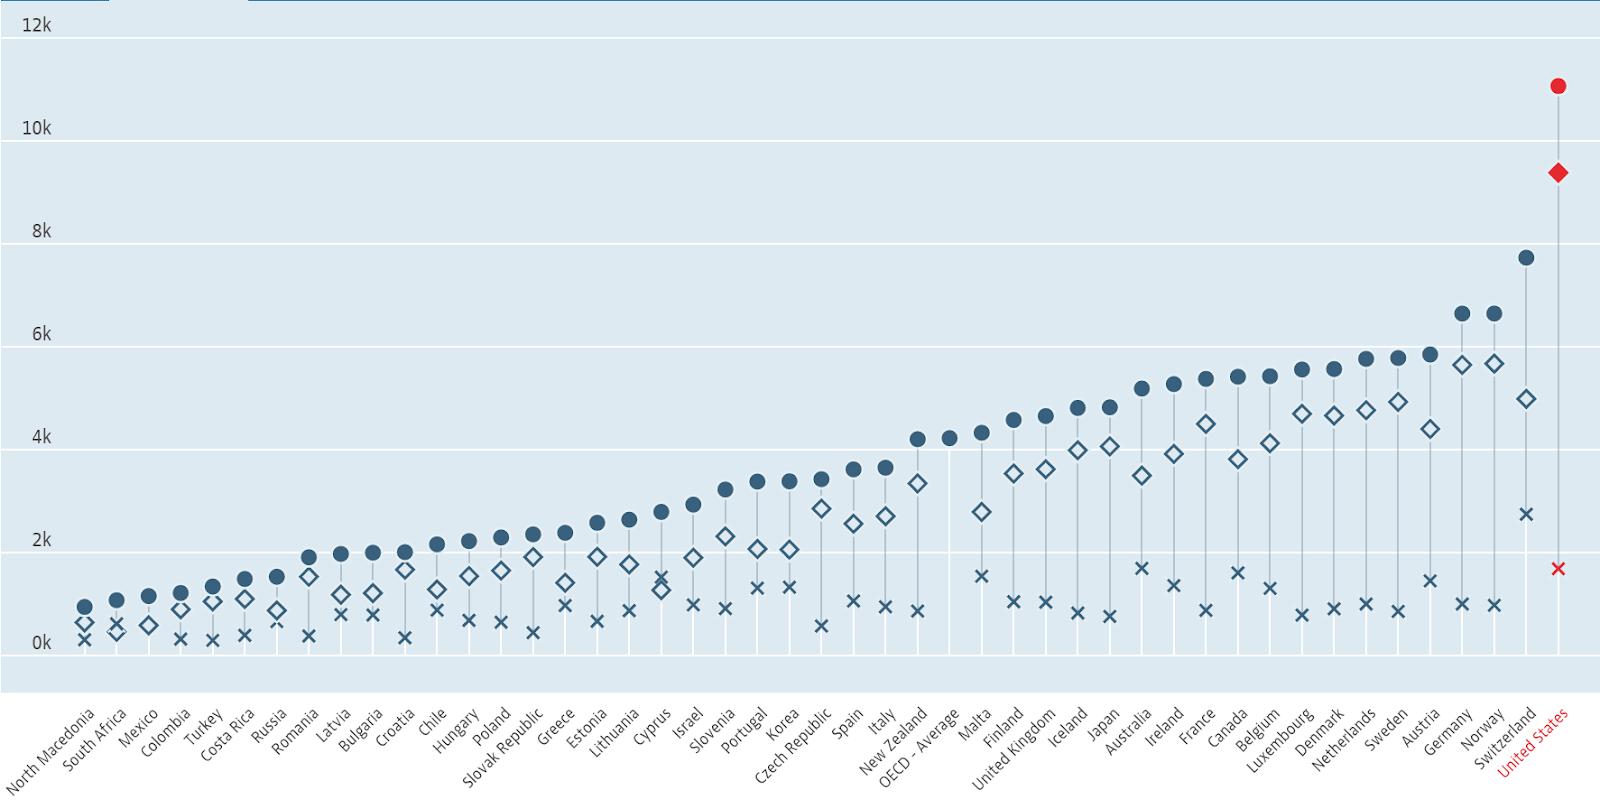 Spending on Healthcare, per capita, 2019 (OECD)